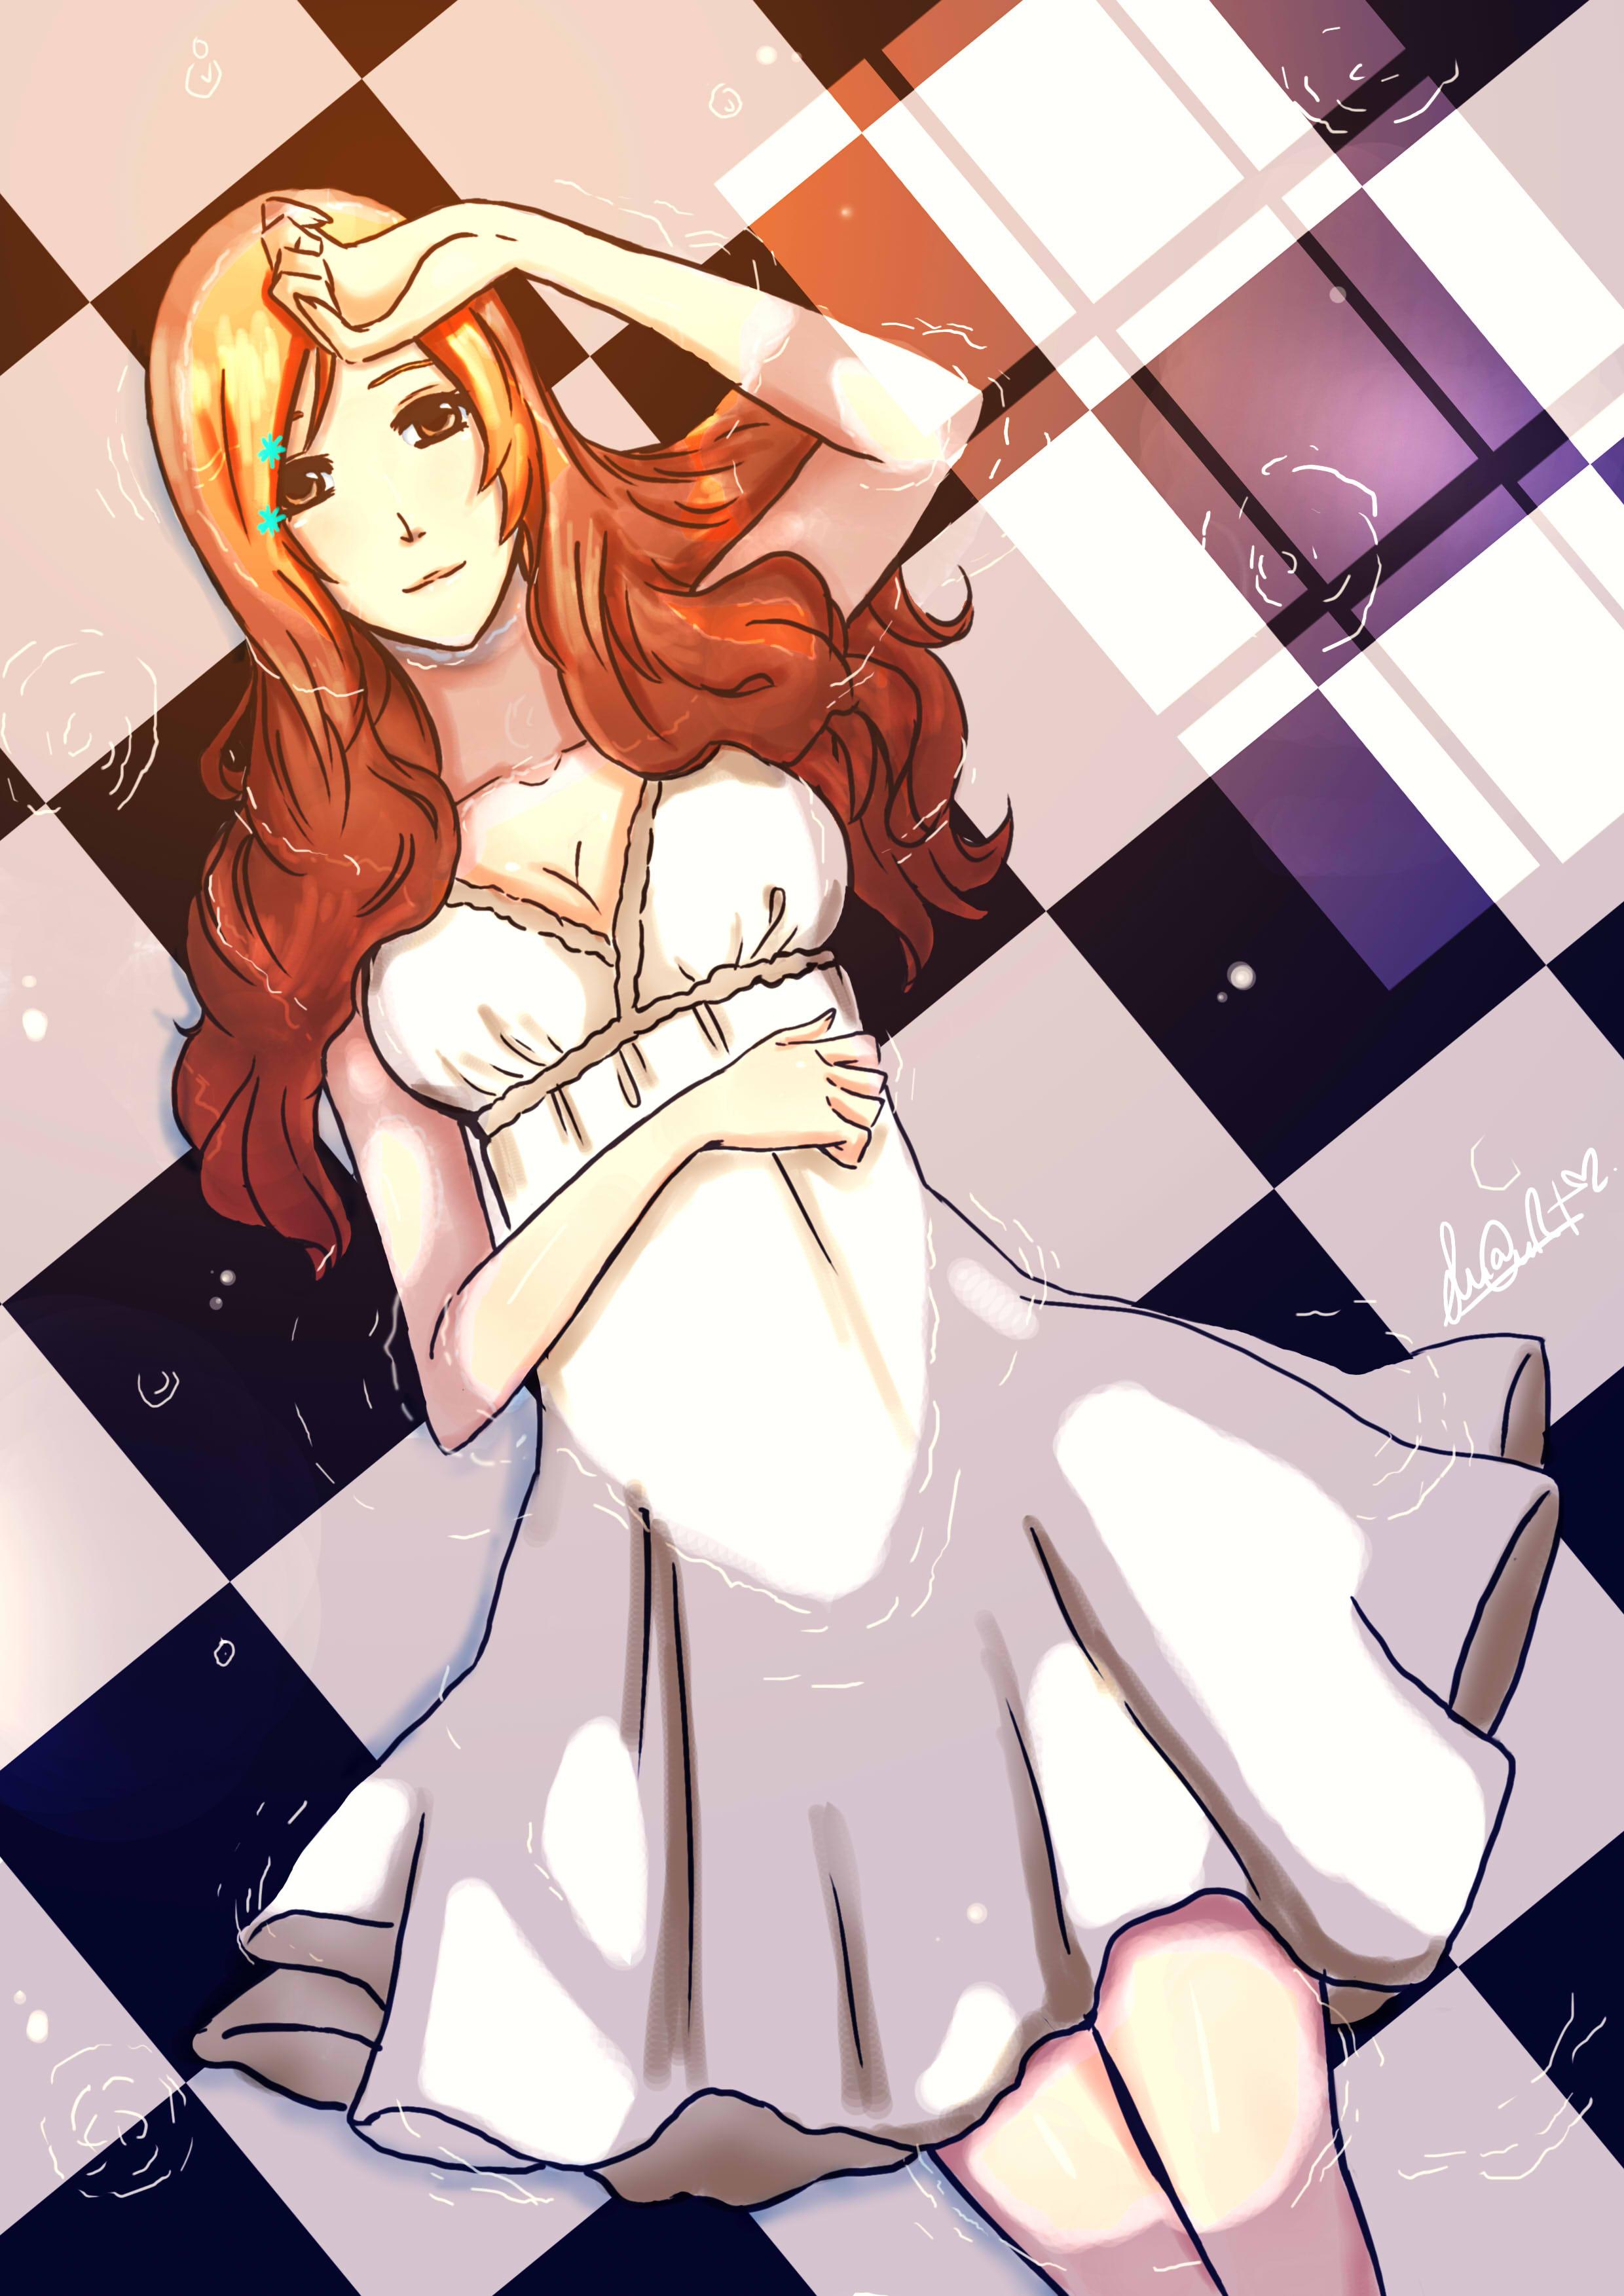 Orihime inoue dress up